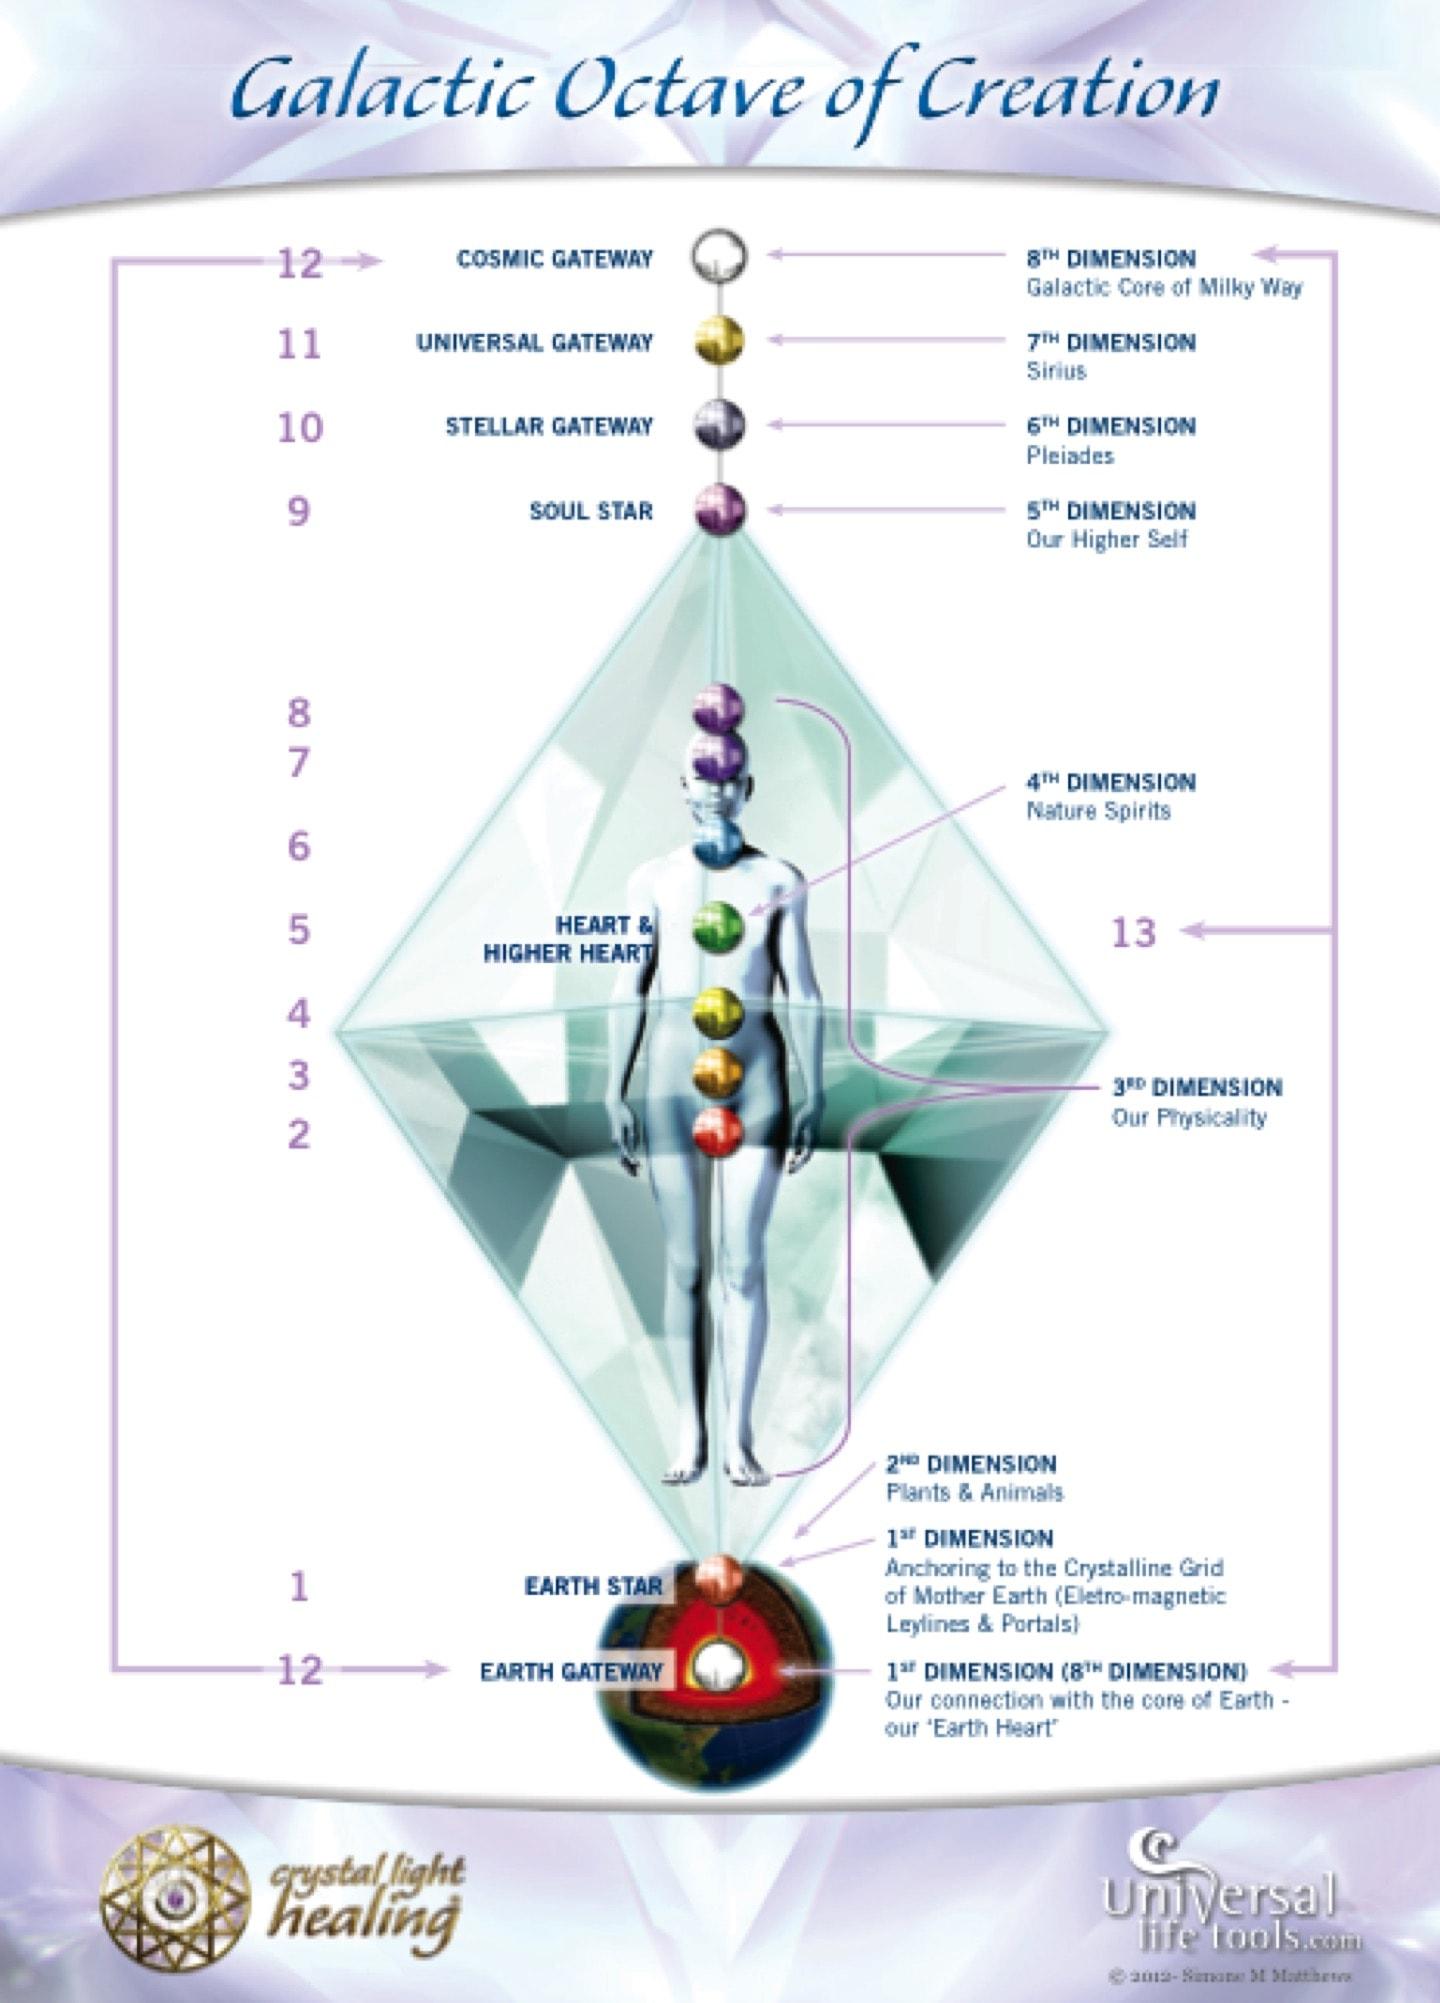 ancient-lemuria-universal-life-tools